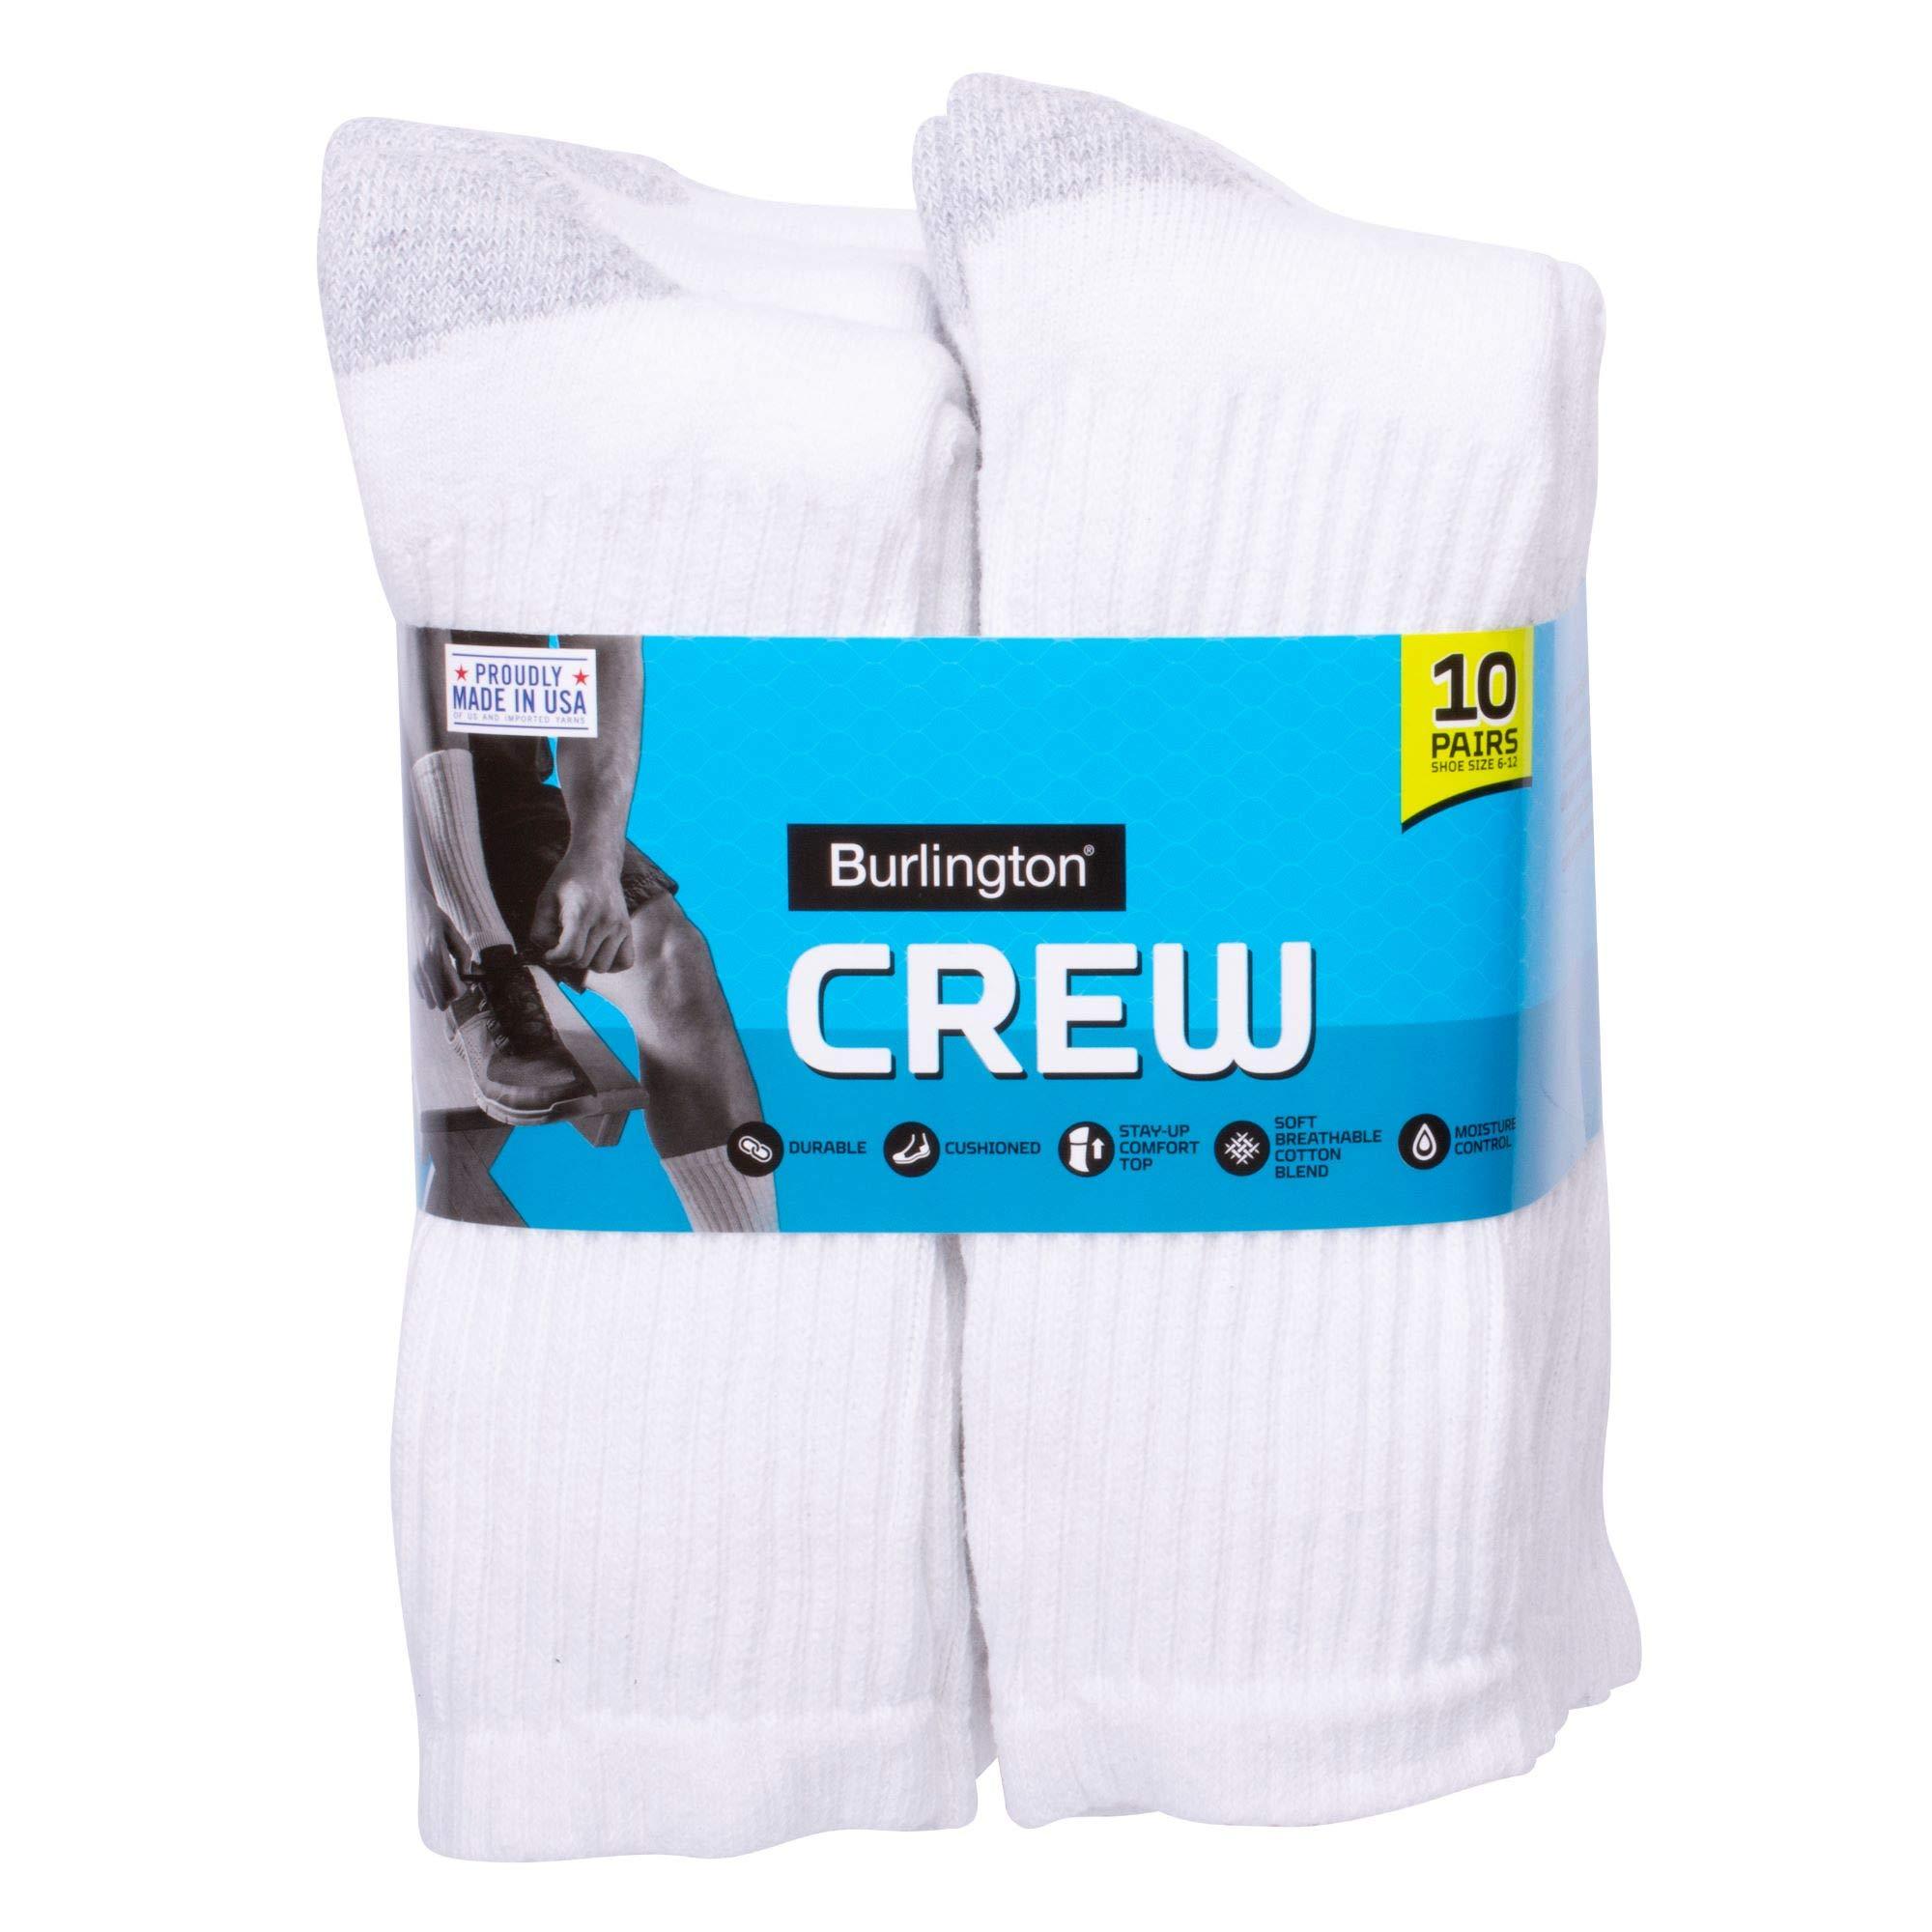 Burlington Comfort Power Men's Crew Sock, 10 Pair Pack